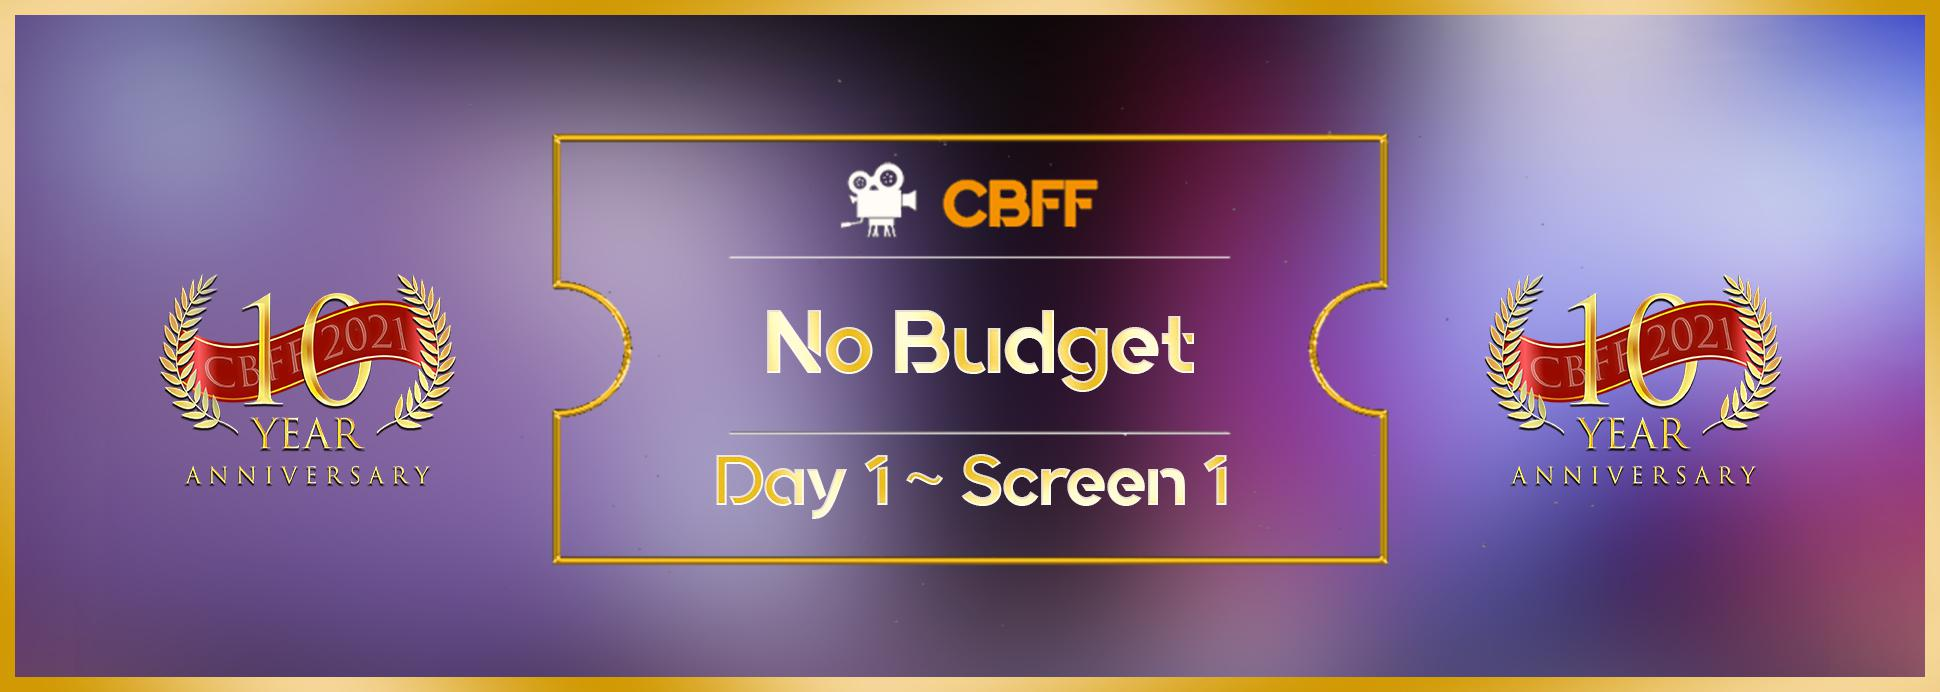 Day 1, Screen 1: No Budget Short Film